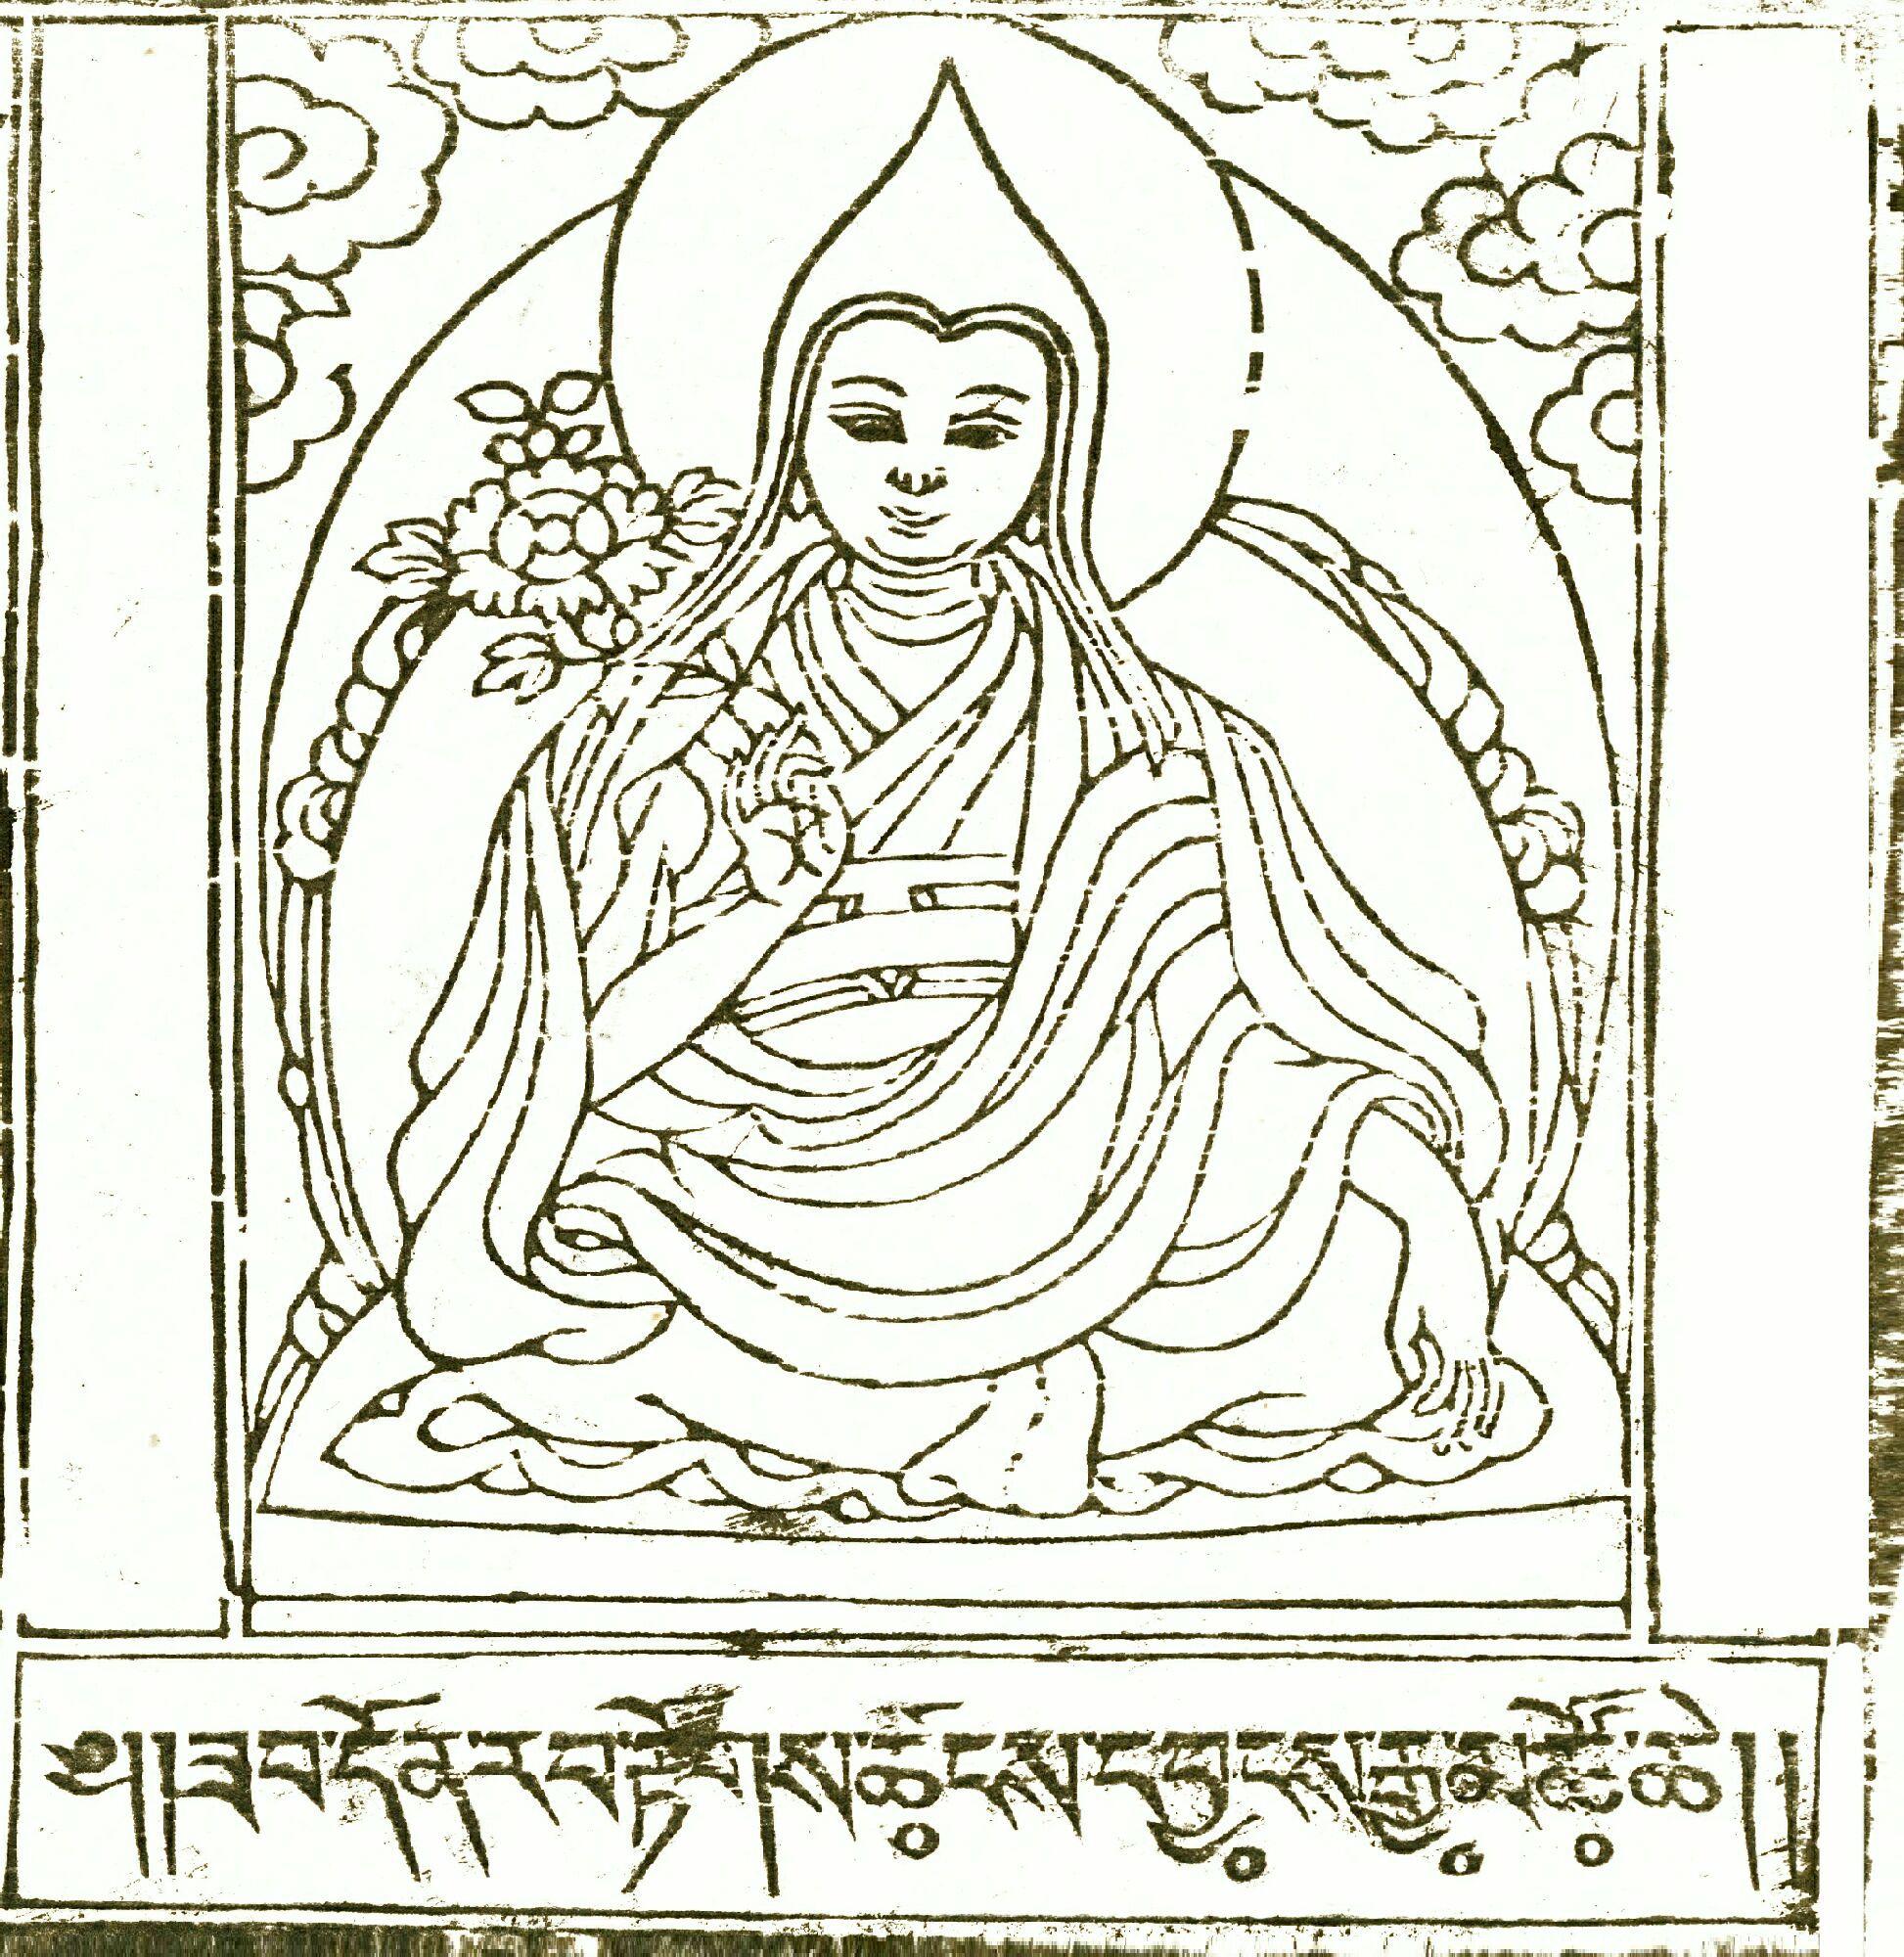 The Short Life And Tragic Of The 6th Dalai Lama